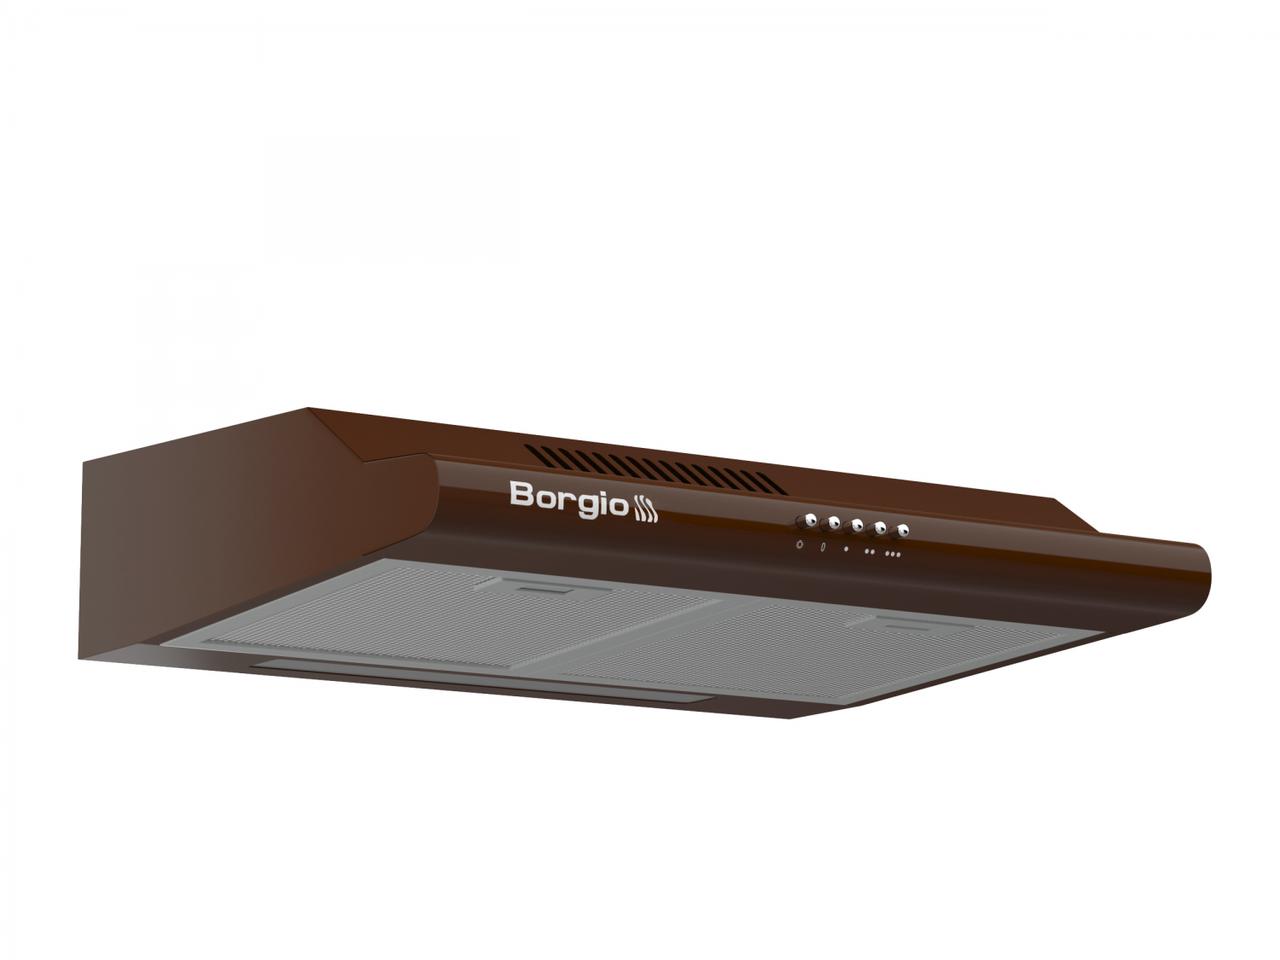 Вытяжка Borgio Gio 50 (коричневый)